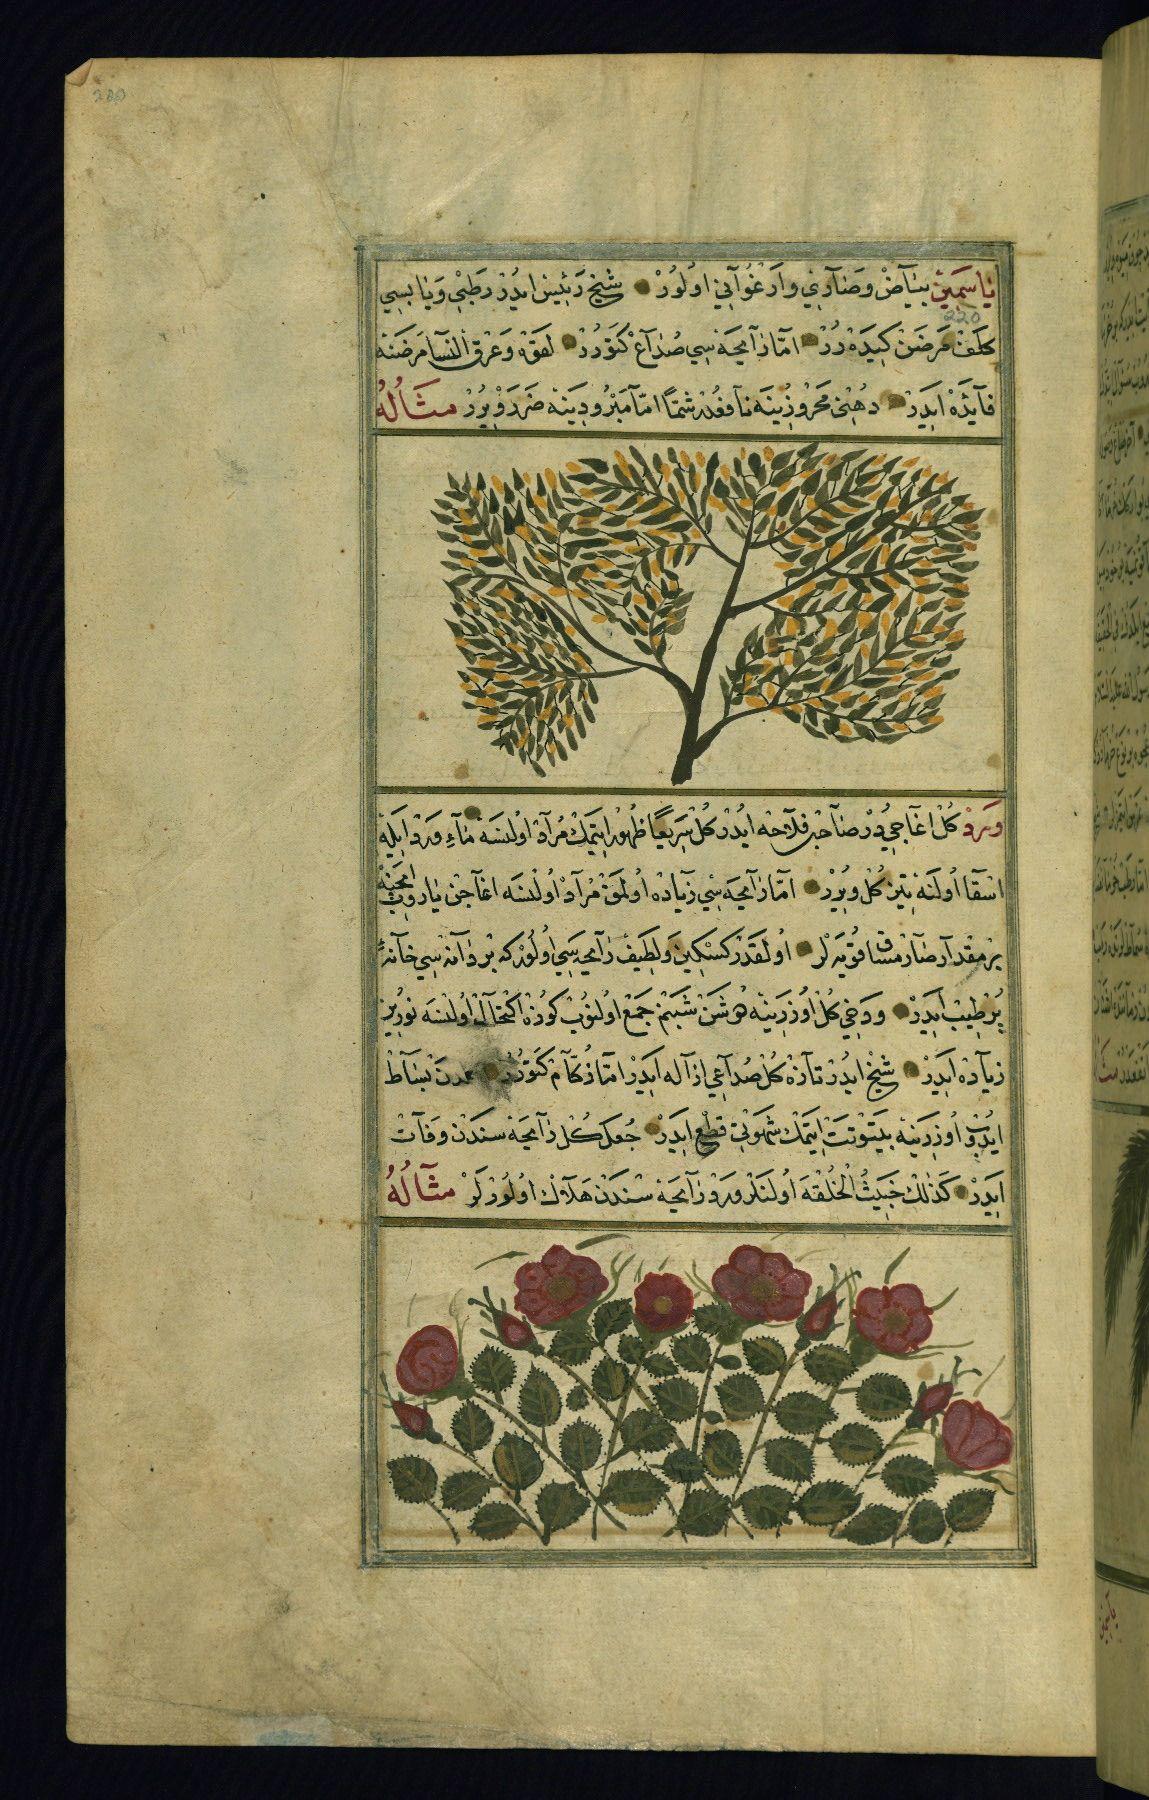 A jasmine bush and a rose bushWonders of Creation  by Qazwīnī 1293 was translated to Turkish in 1717  completed by Rūzmah-ʾi Nāthānī - W659